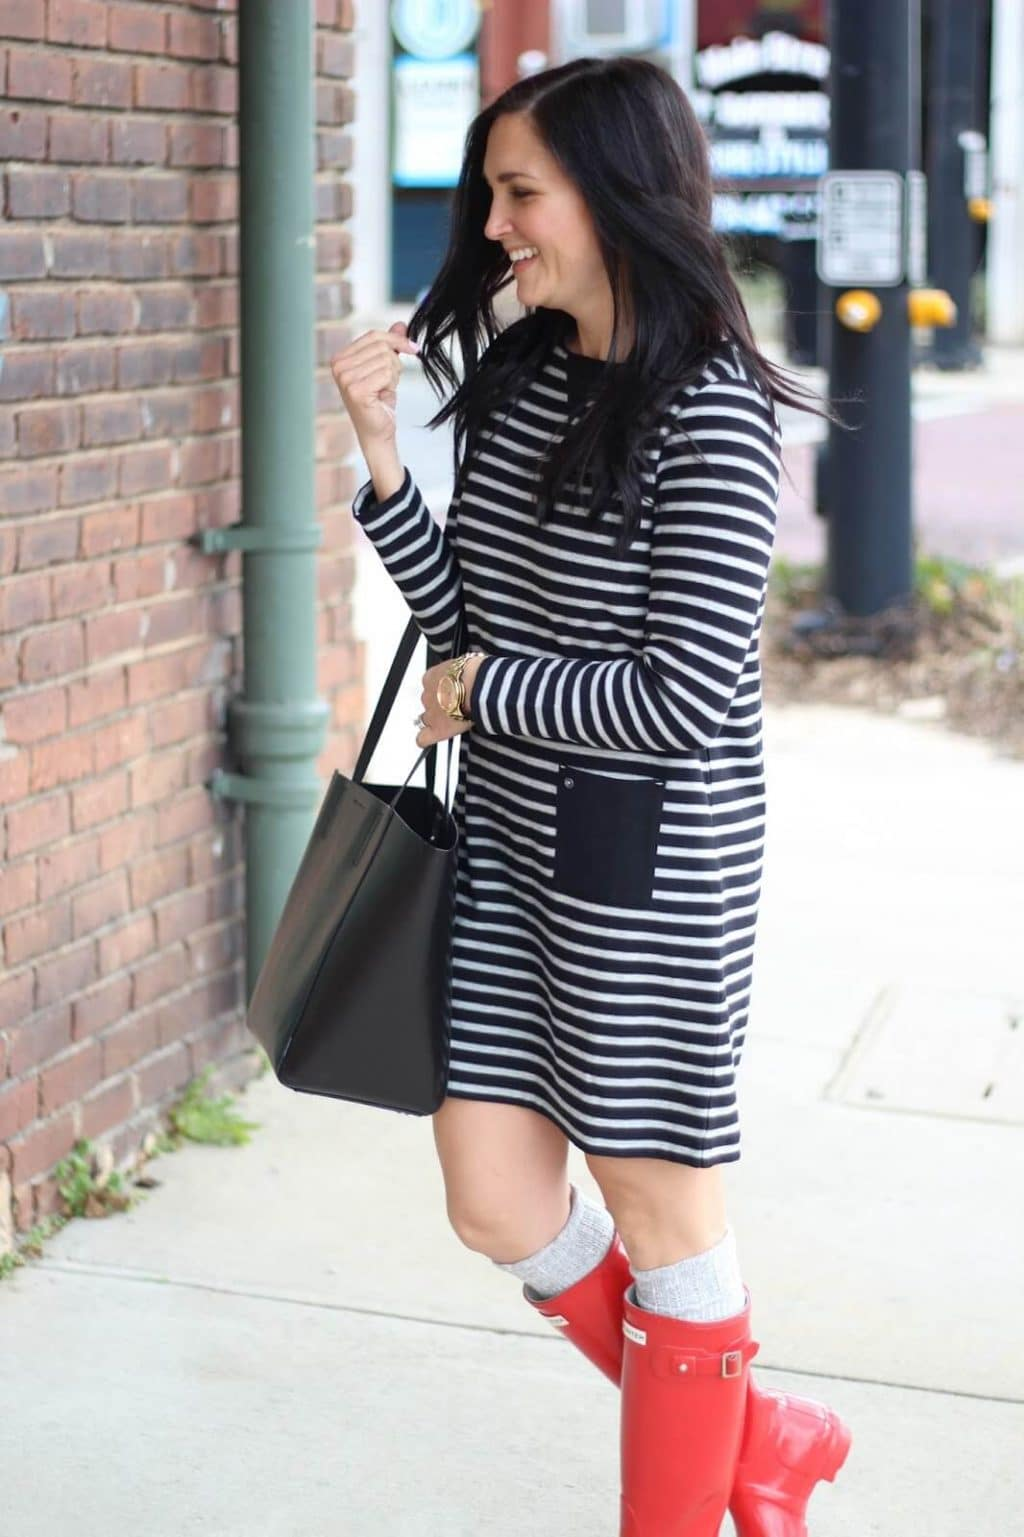 #JJillStyle Black and grey stipe dress